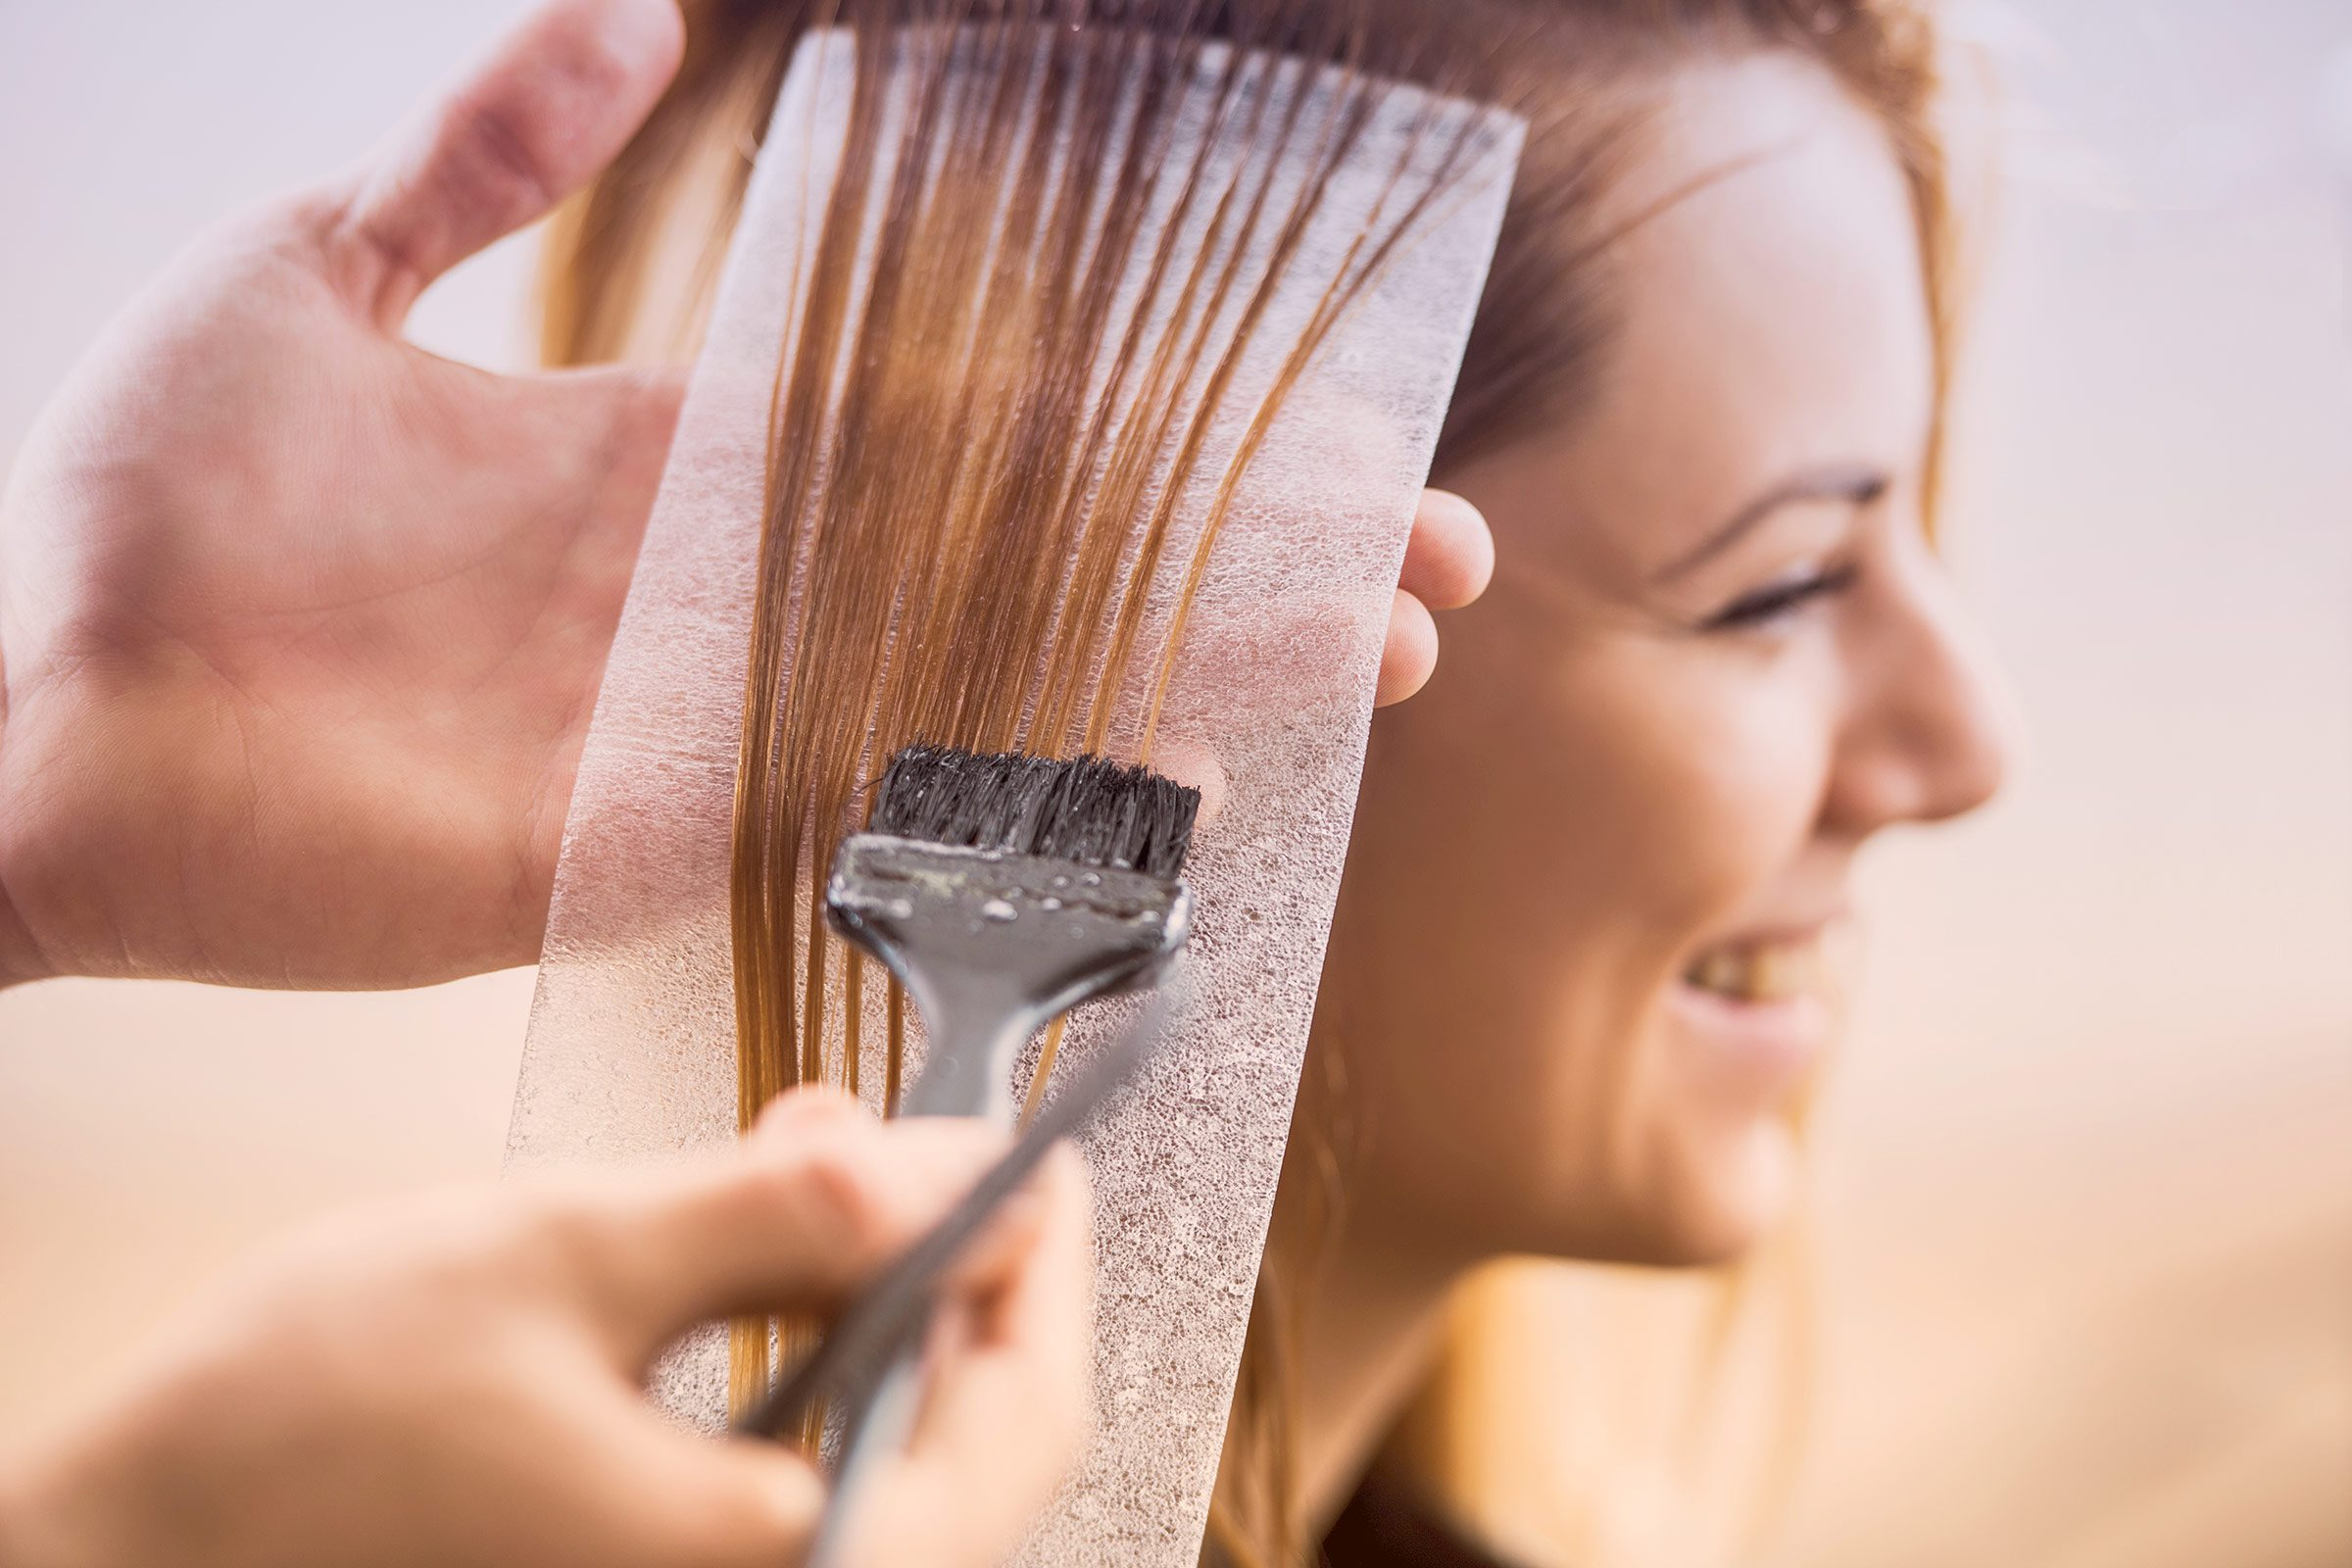 Using hair dye: possibly harmful.